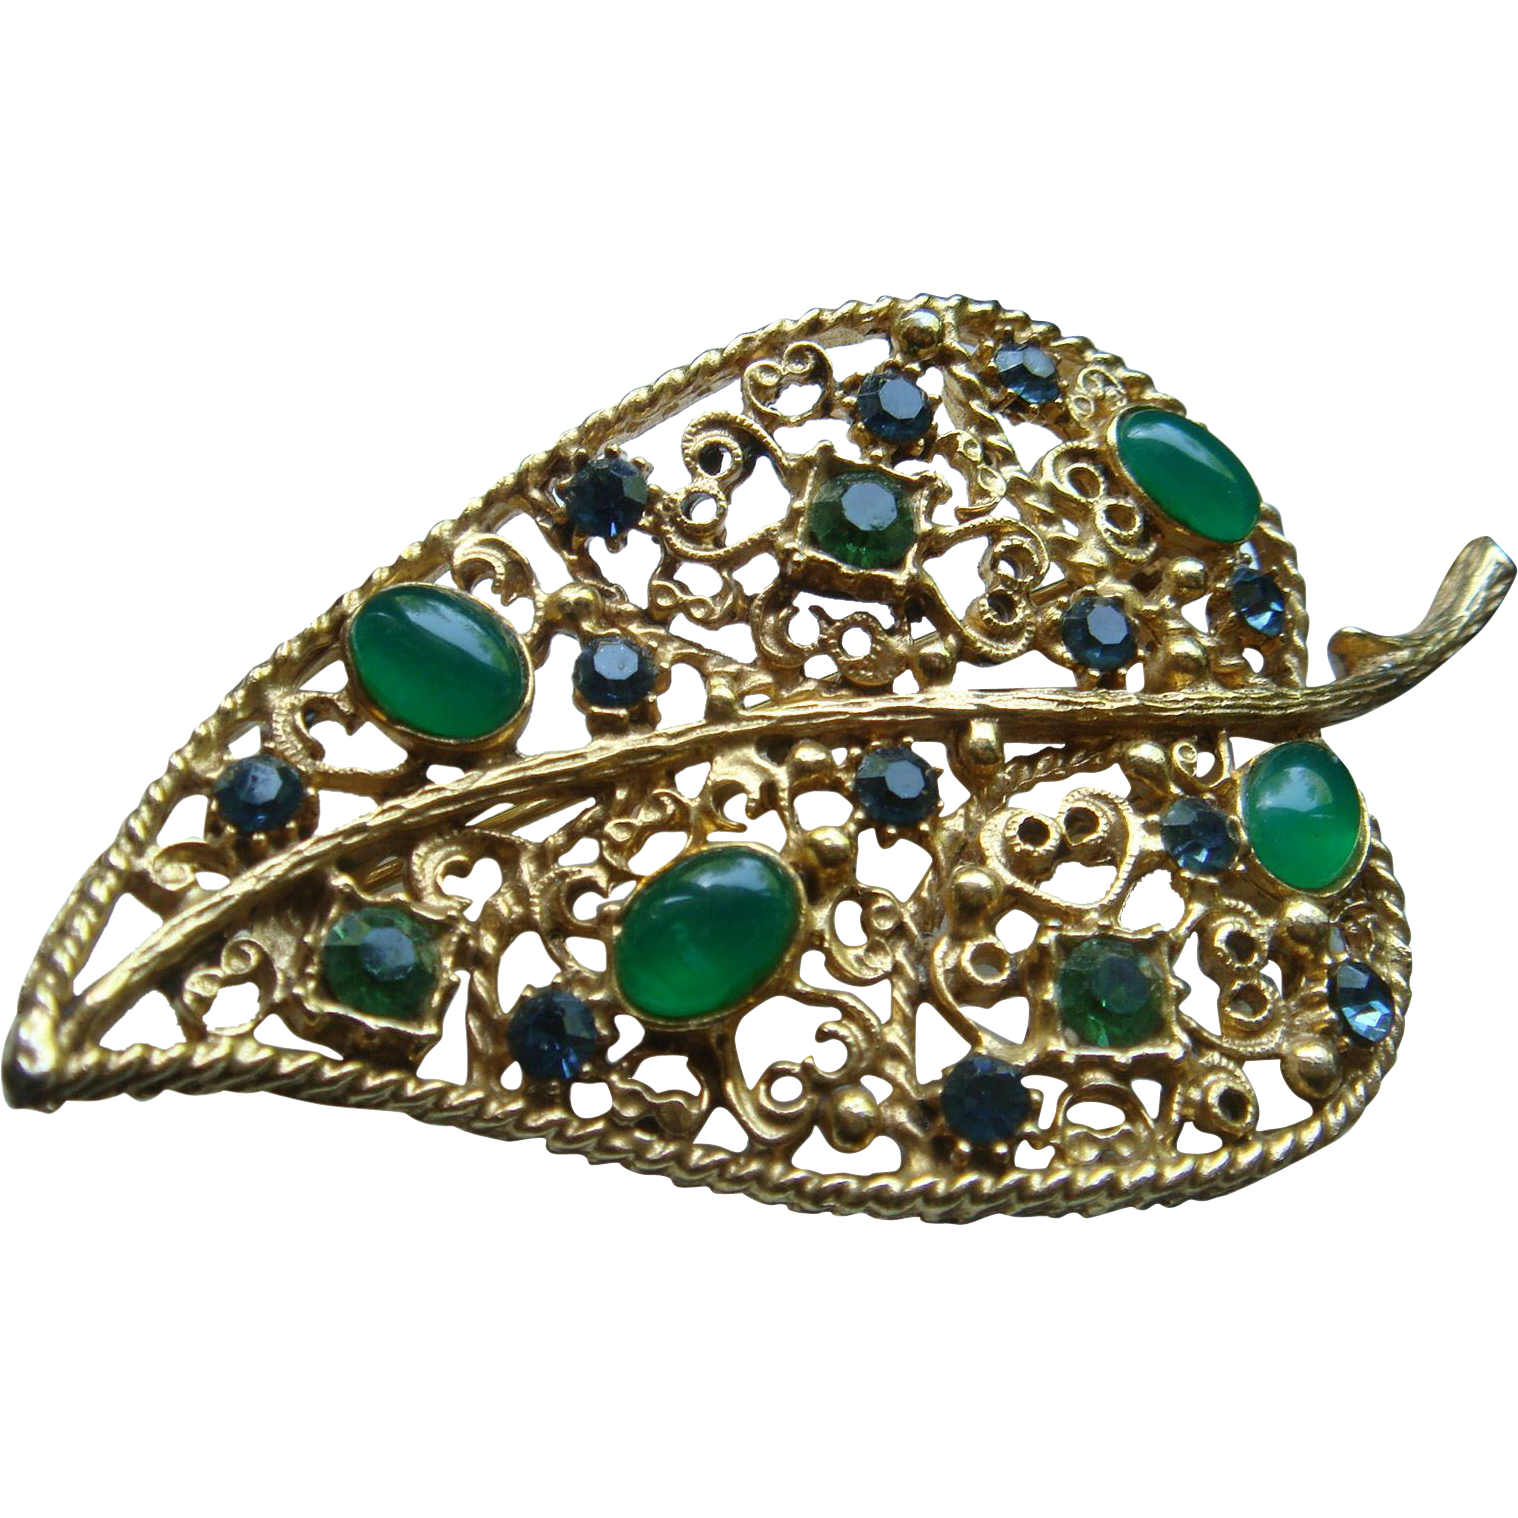 Vintage Filigree Florenza Leaf Brooch Emerald Jade Green Cabochons and Rhinestones